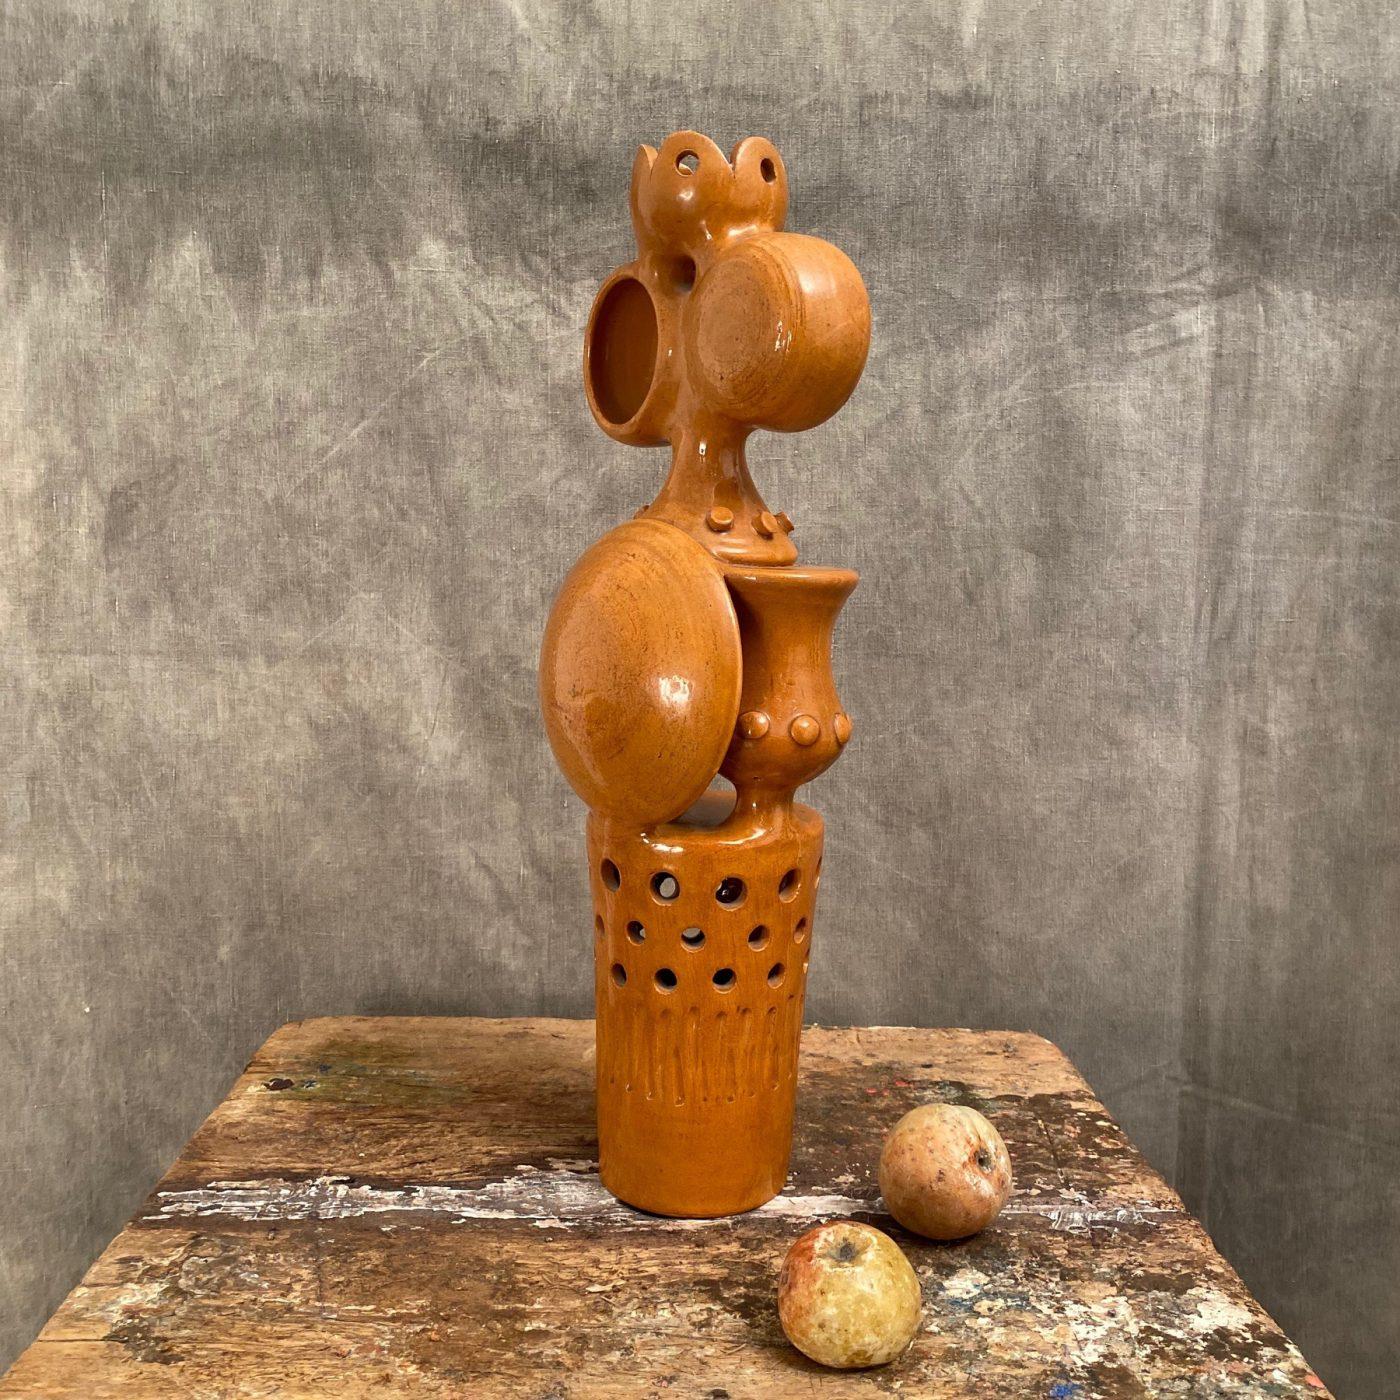 tall-ceramic-sculpture0001